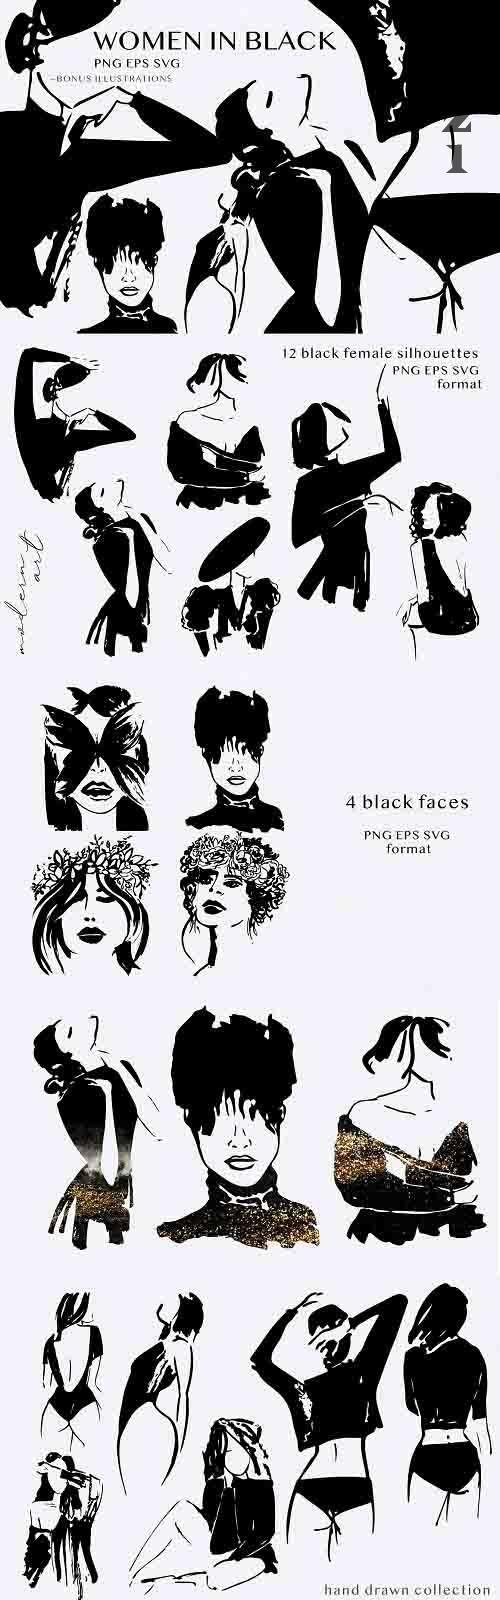 Black women silhouettes - 5929320